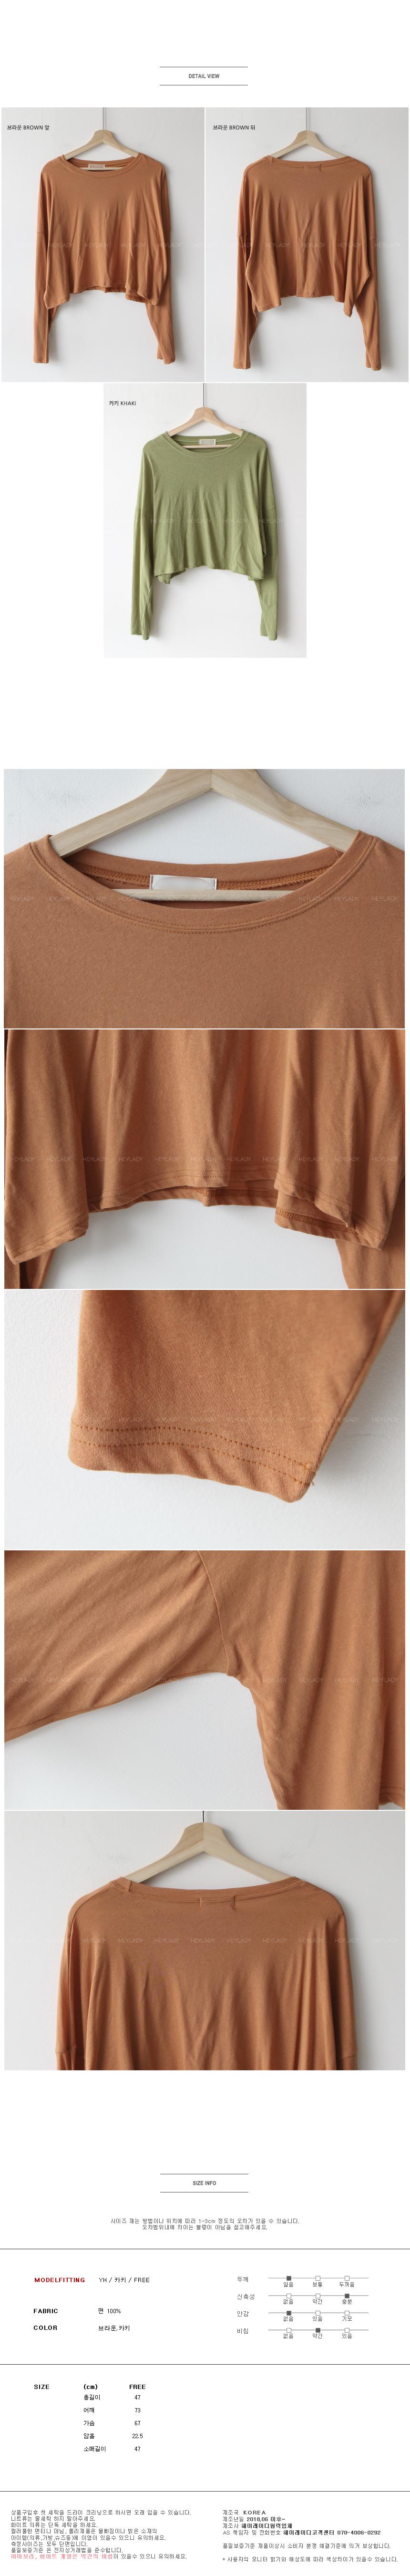 Rota cropped T-shirt